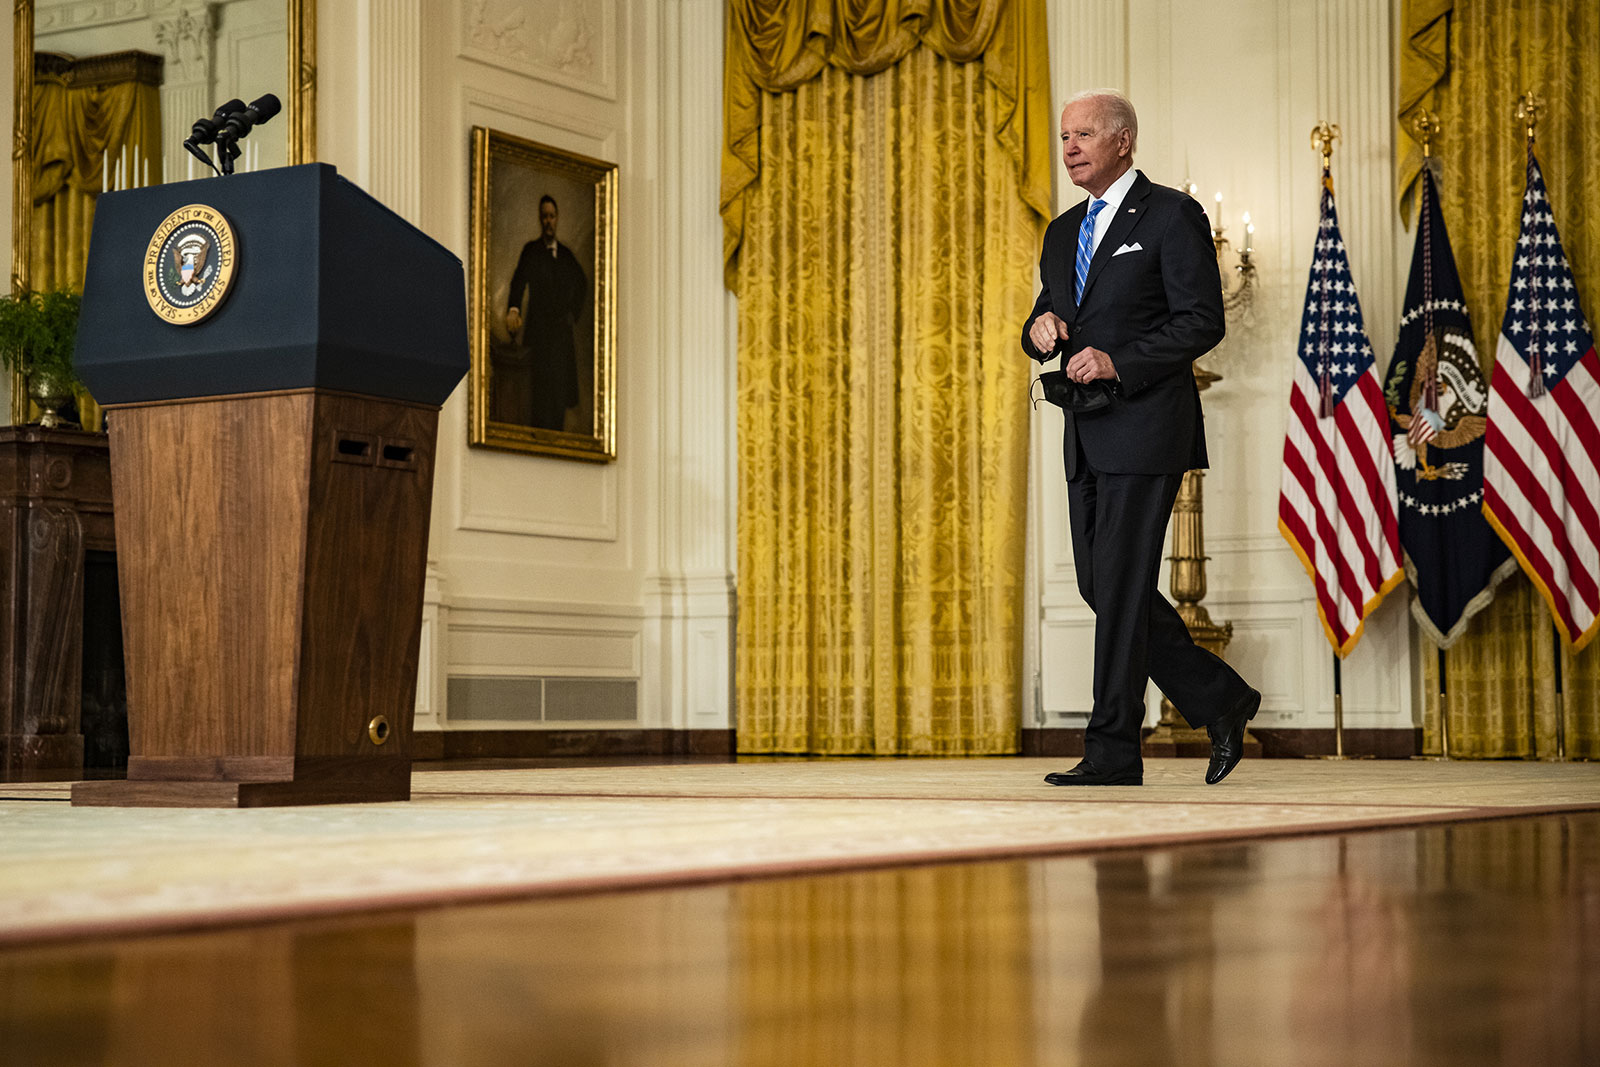 (Samuel Corum/Bloomberg/Getty Images)